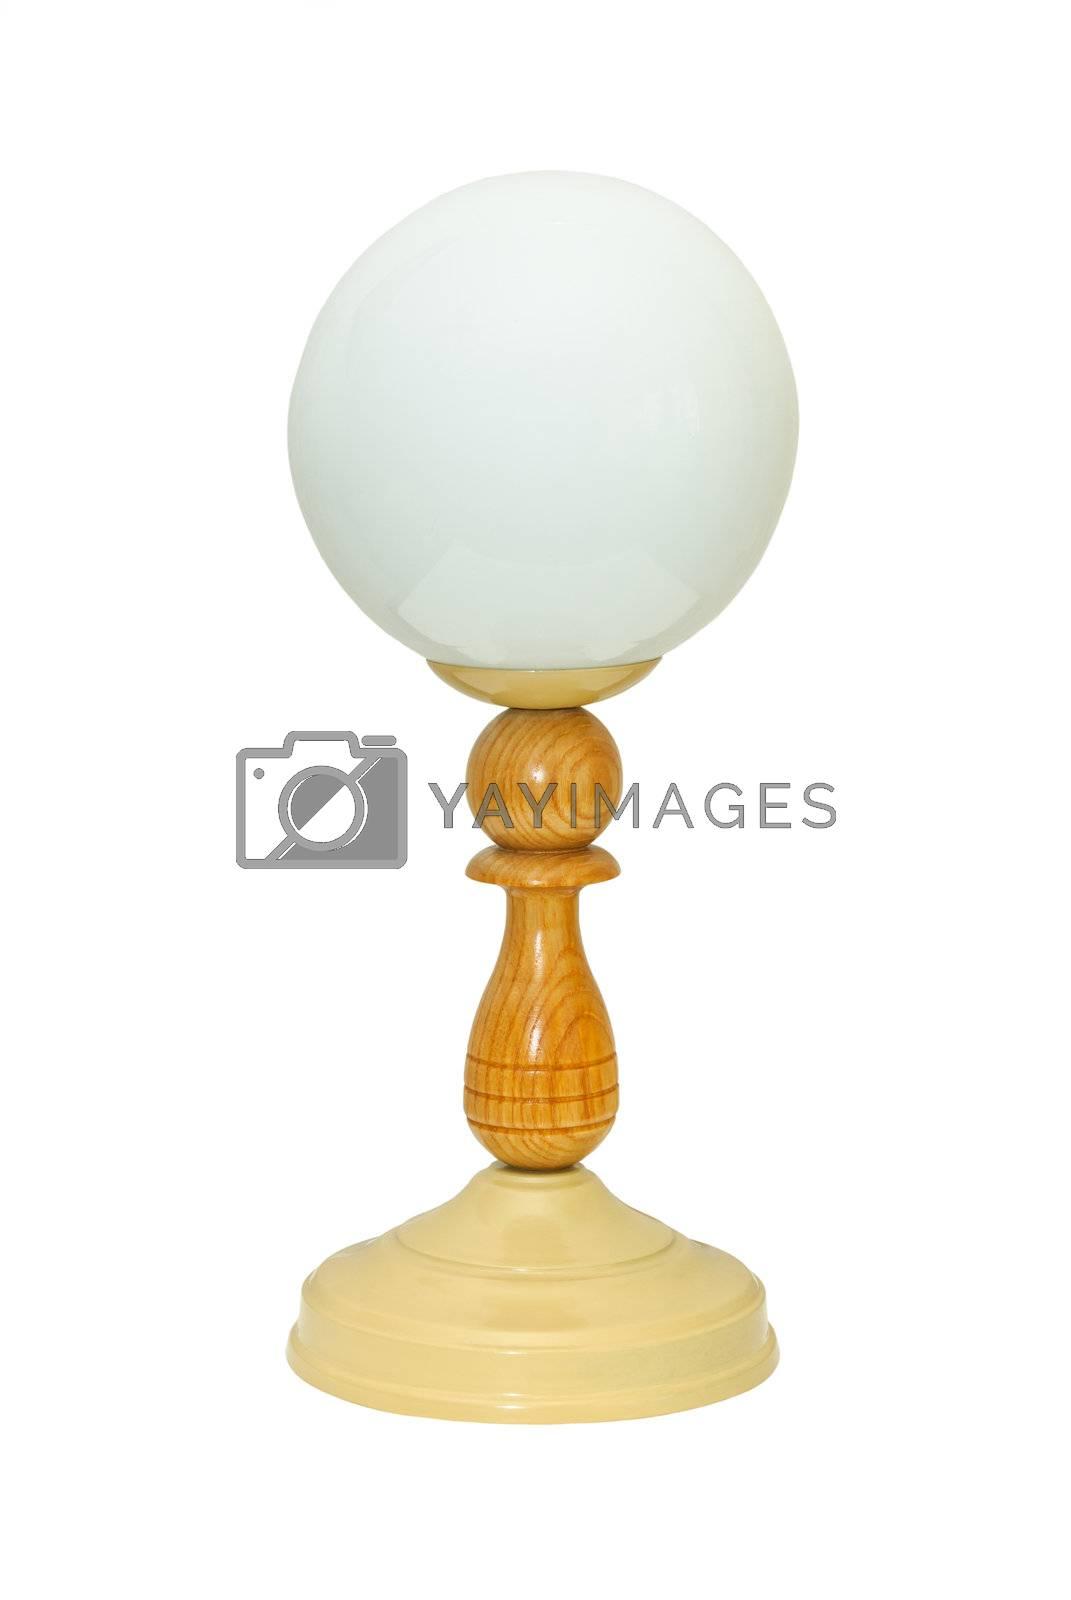 Desk lamp, isolated on white background